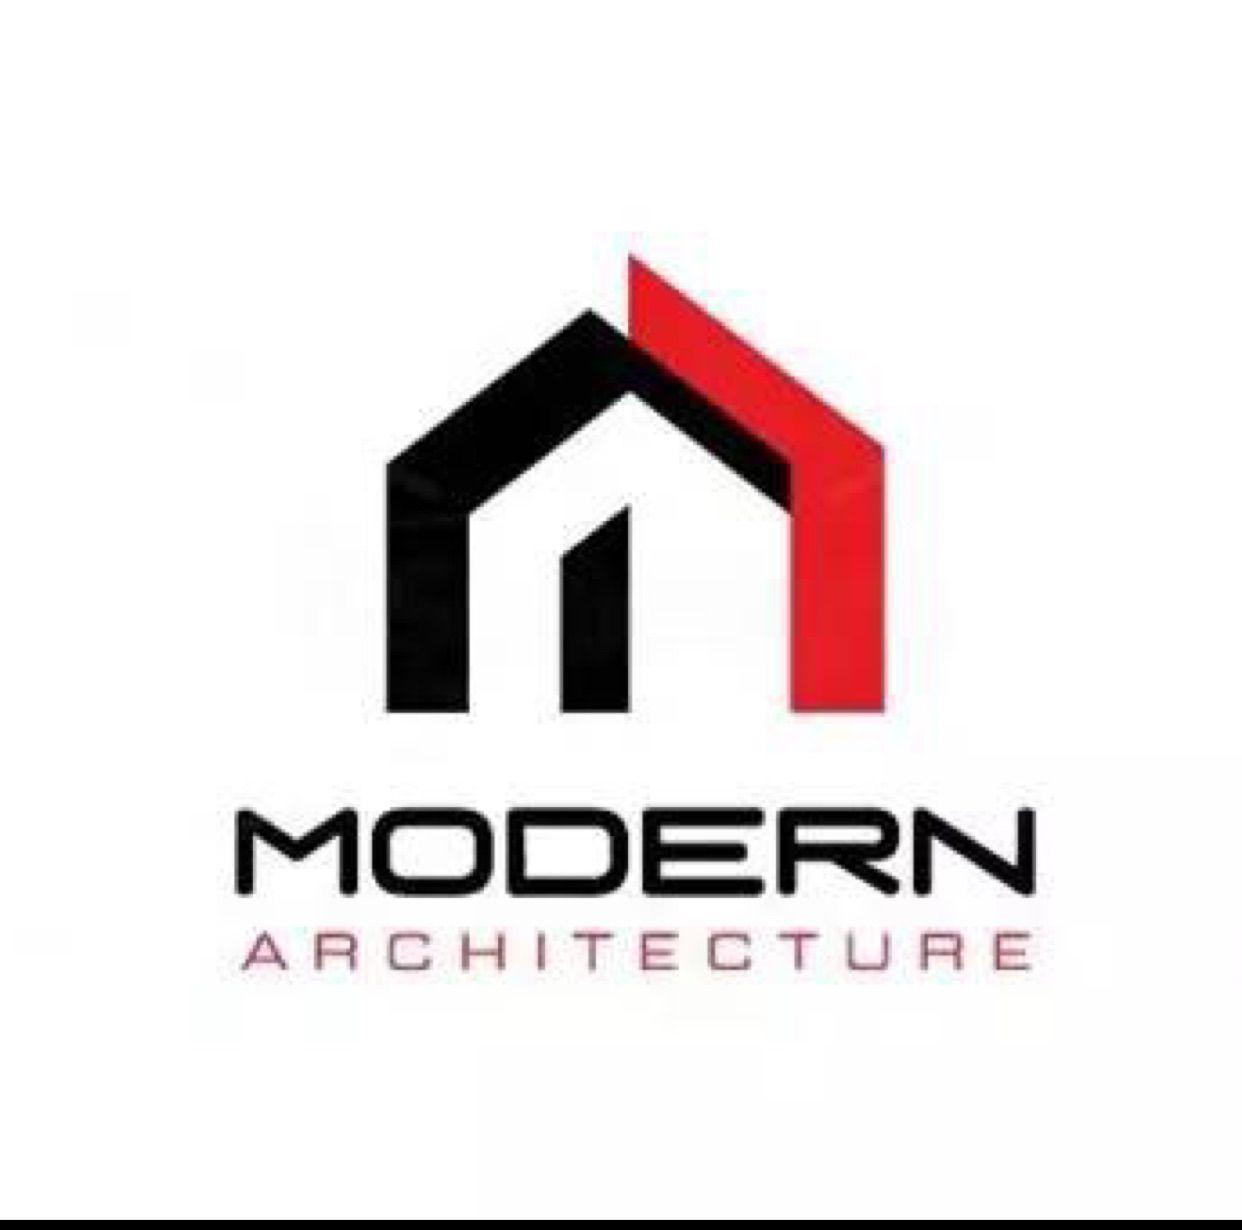 logo logo 标志 设计 图标 1242_1230